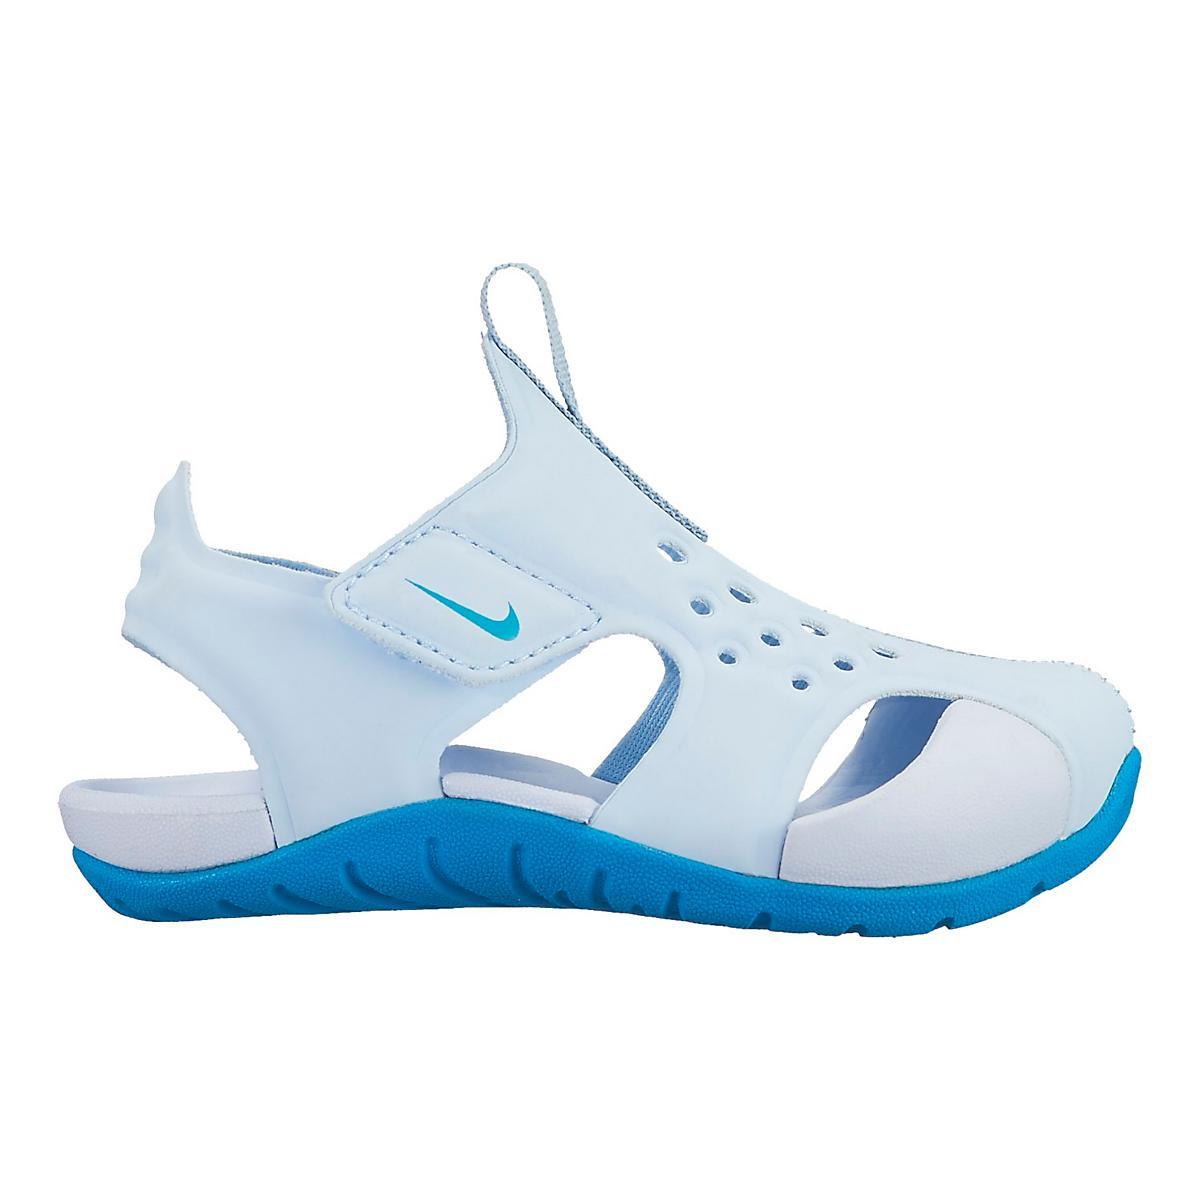 78441dc76b89 ... release date kids nike sunray protect 2 sandals shoe 5d99f fbf40